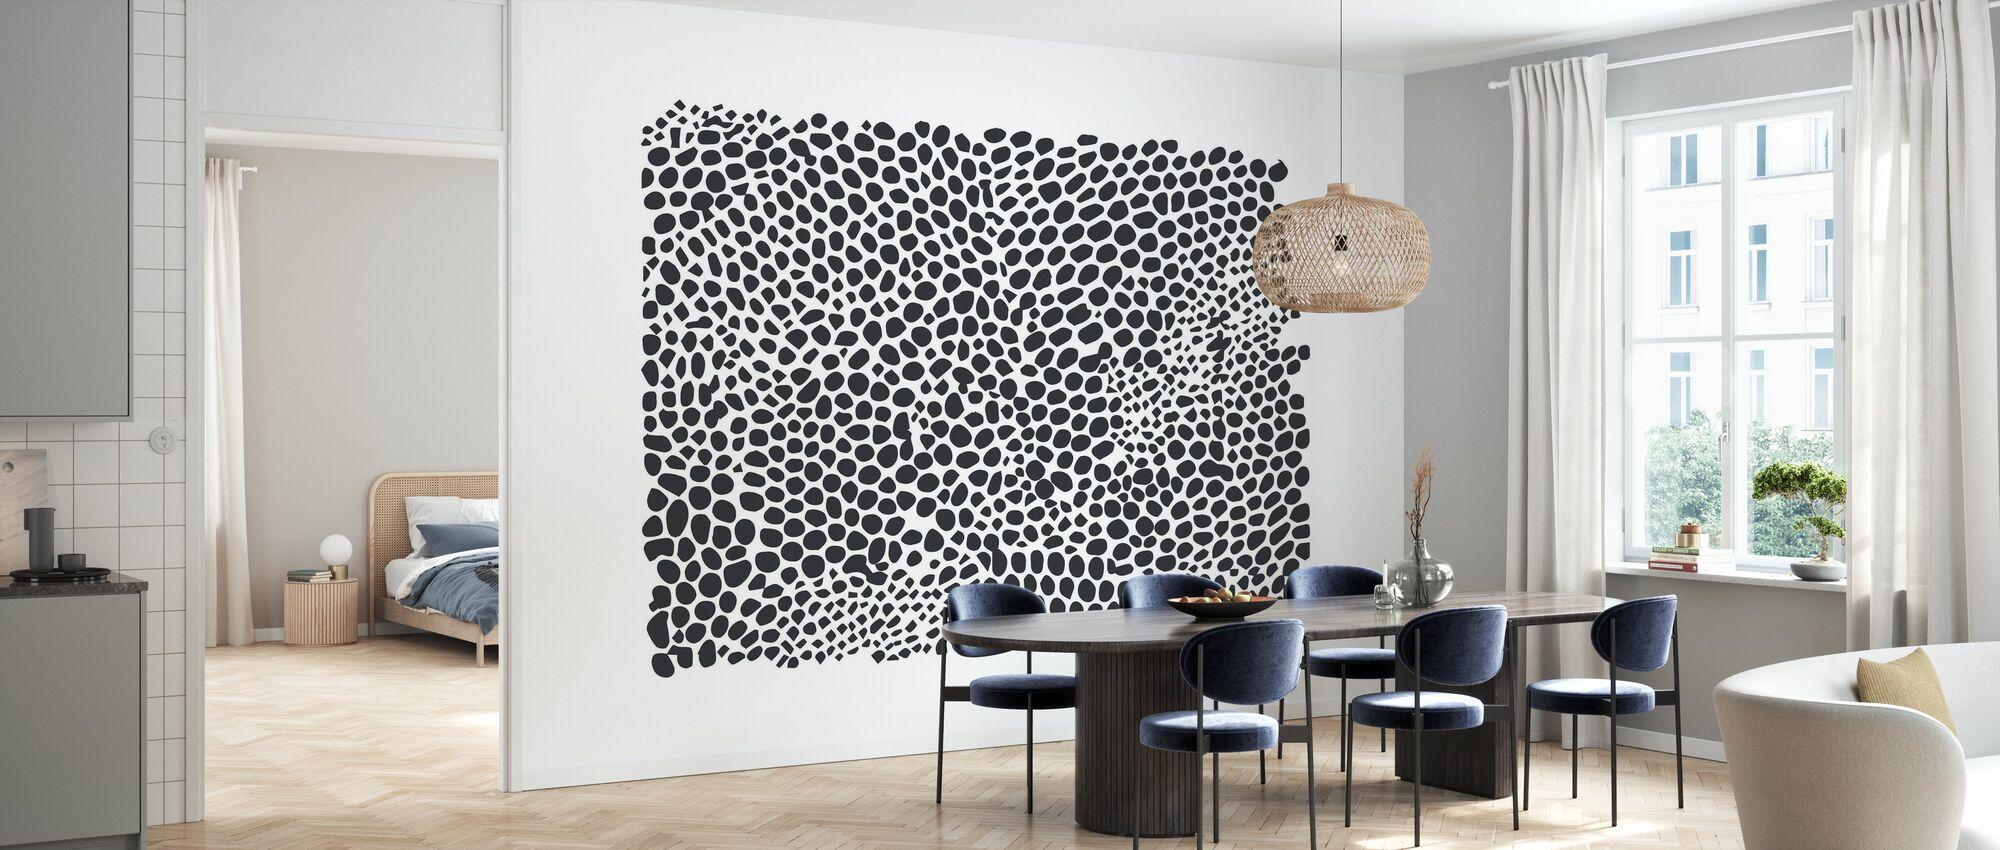 Snakeskin - Wallpaper - Kitchen